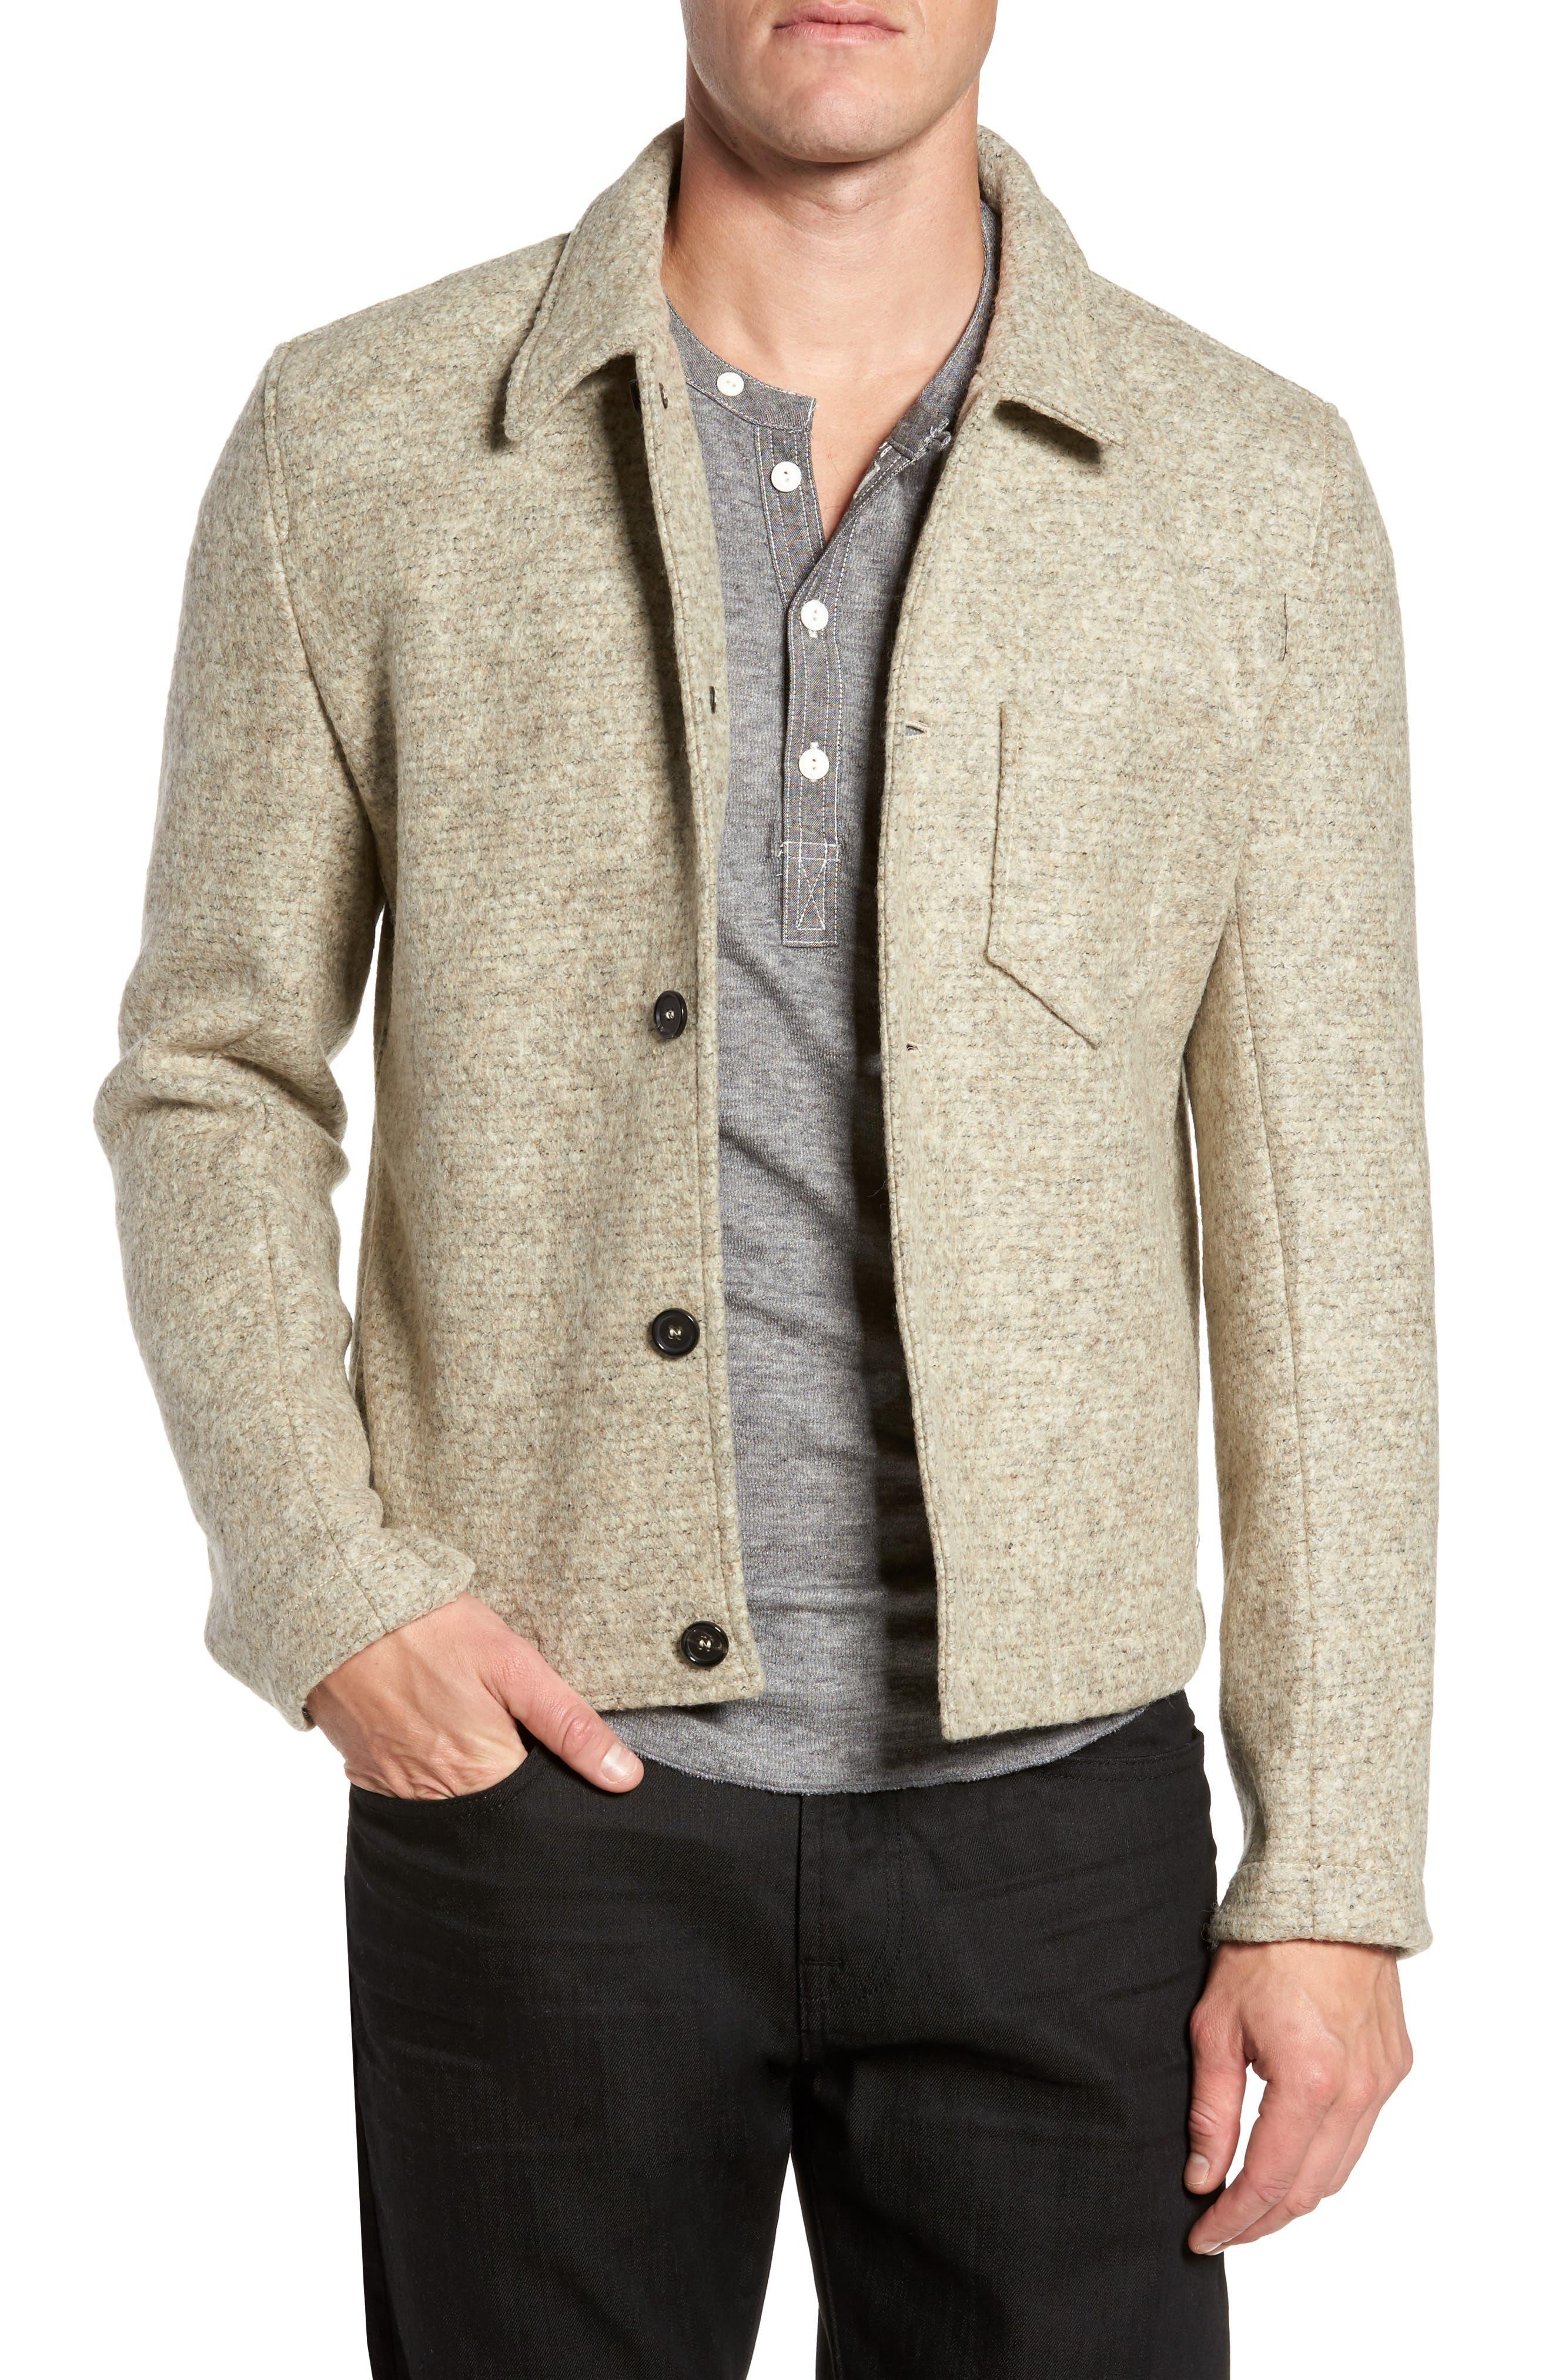 Gunner Wool Blend Jacket,                             Main thumbnail 1, color,                             270